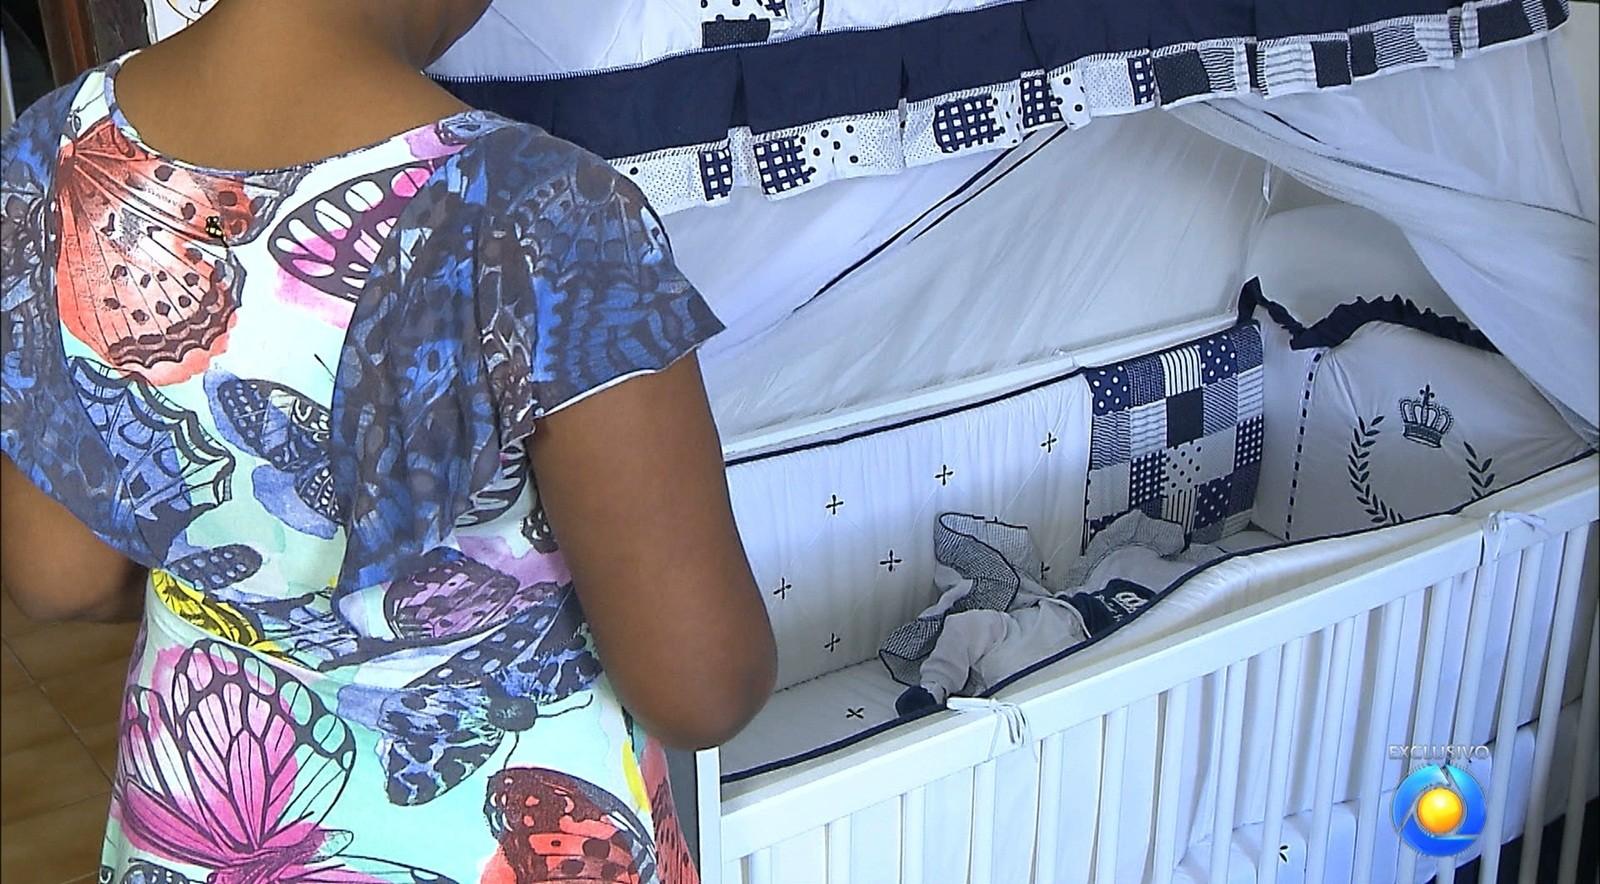 Menina de 11 anos que deu à luz após engravidar em estupro recebe alta médica